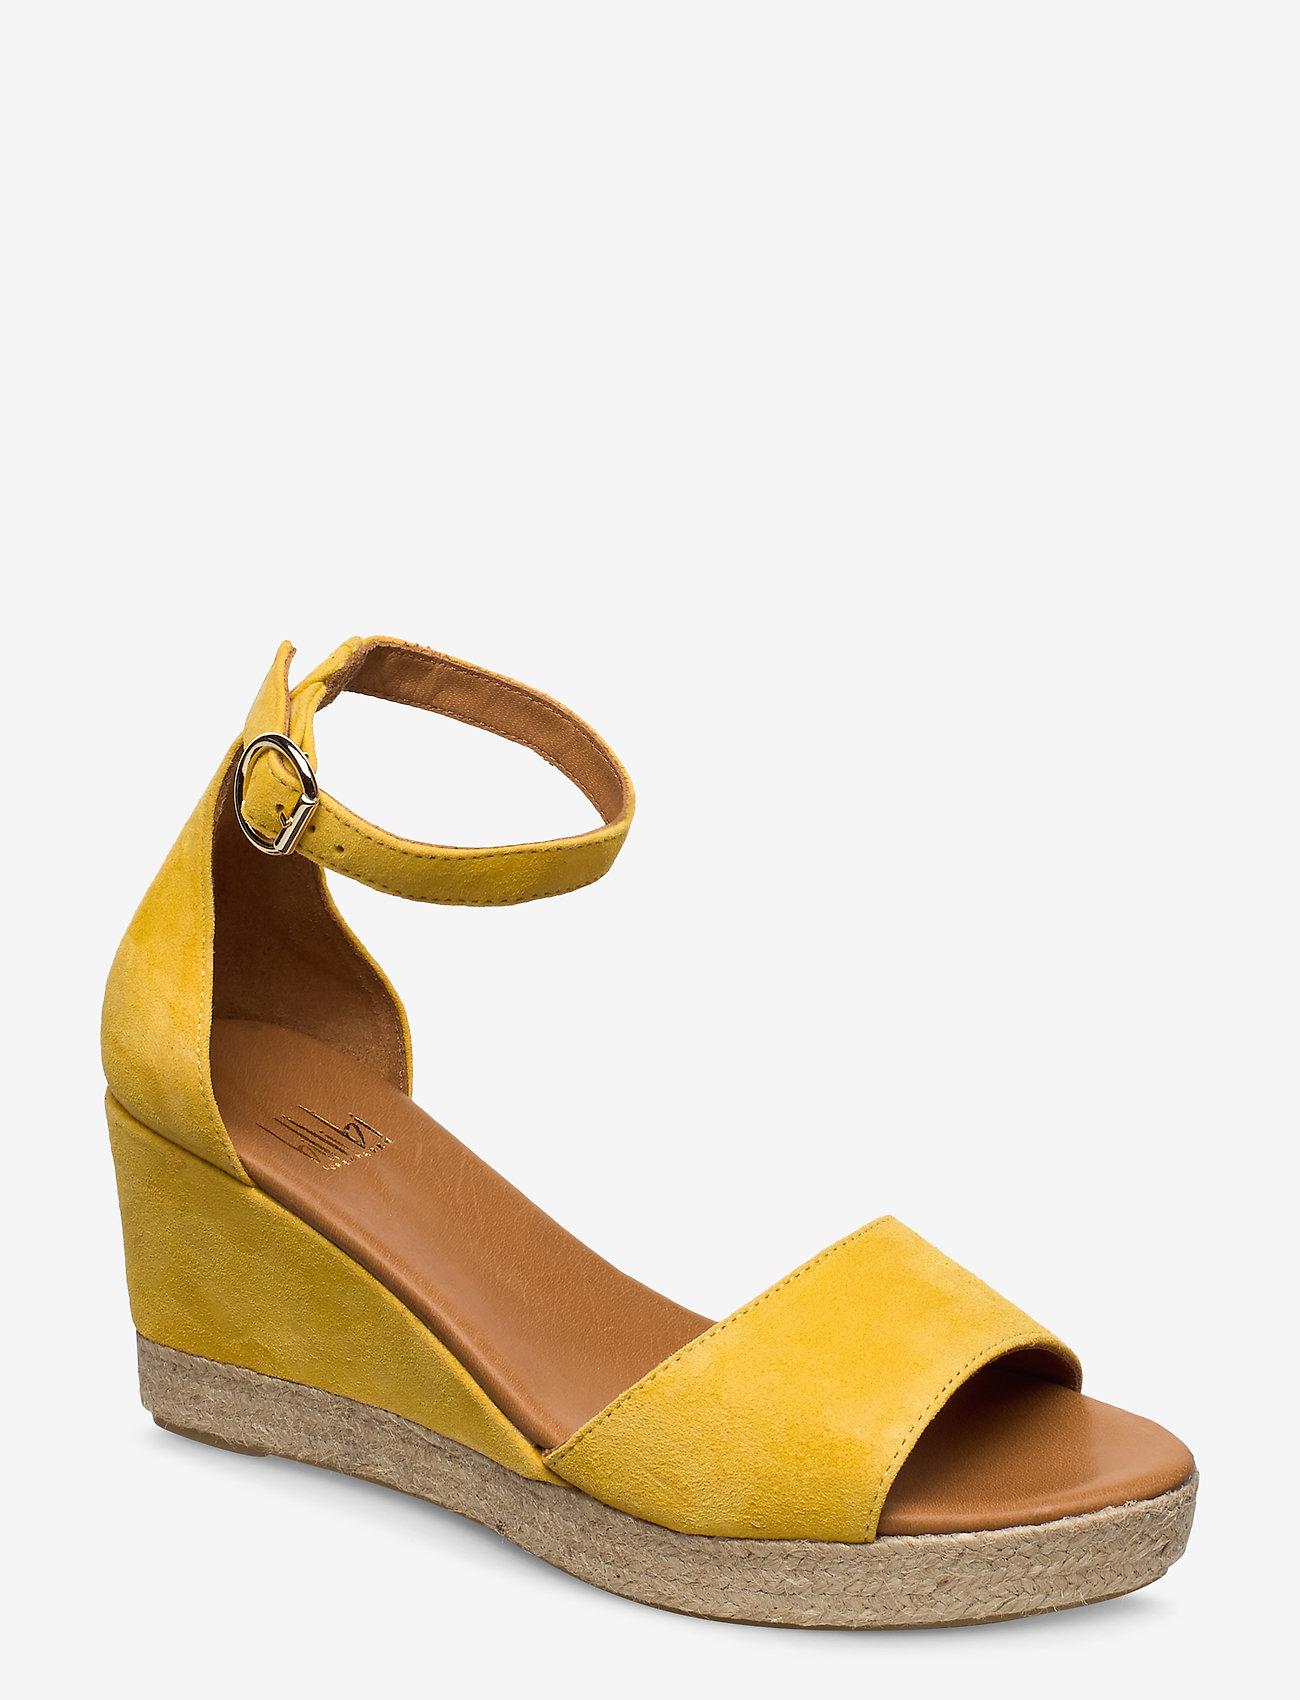 Billi Bi - Espadrilles 4332 - espadrilles med hæl - yellow 1795 suede 56 - 0